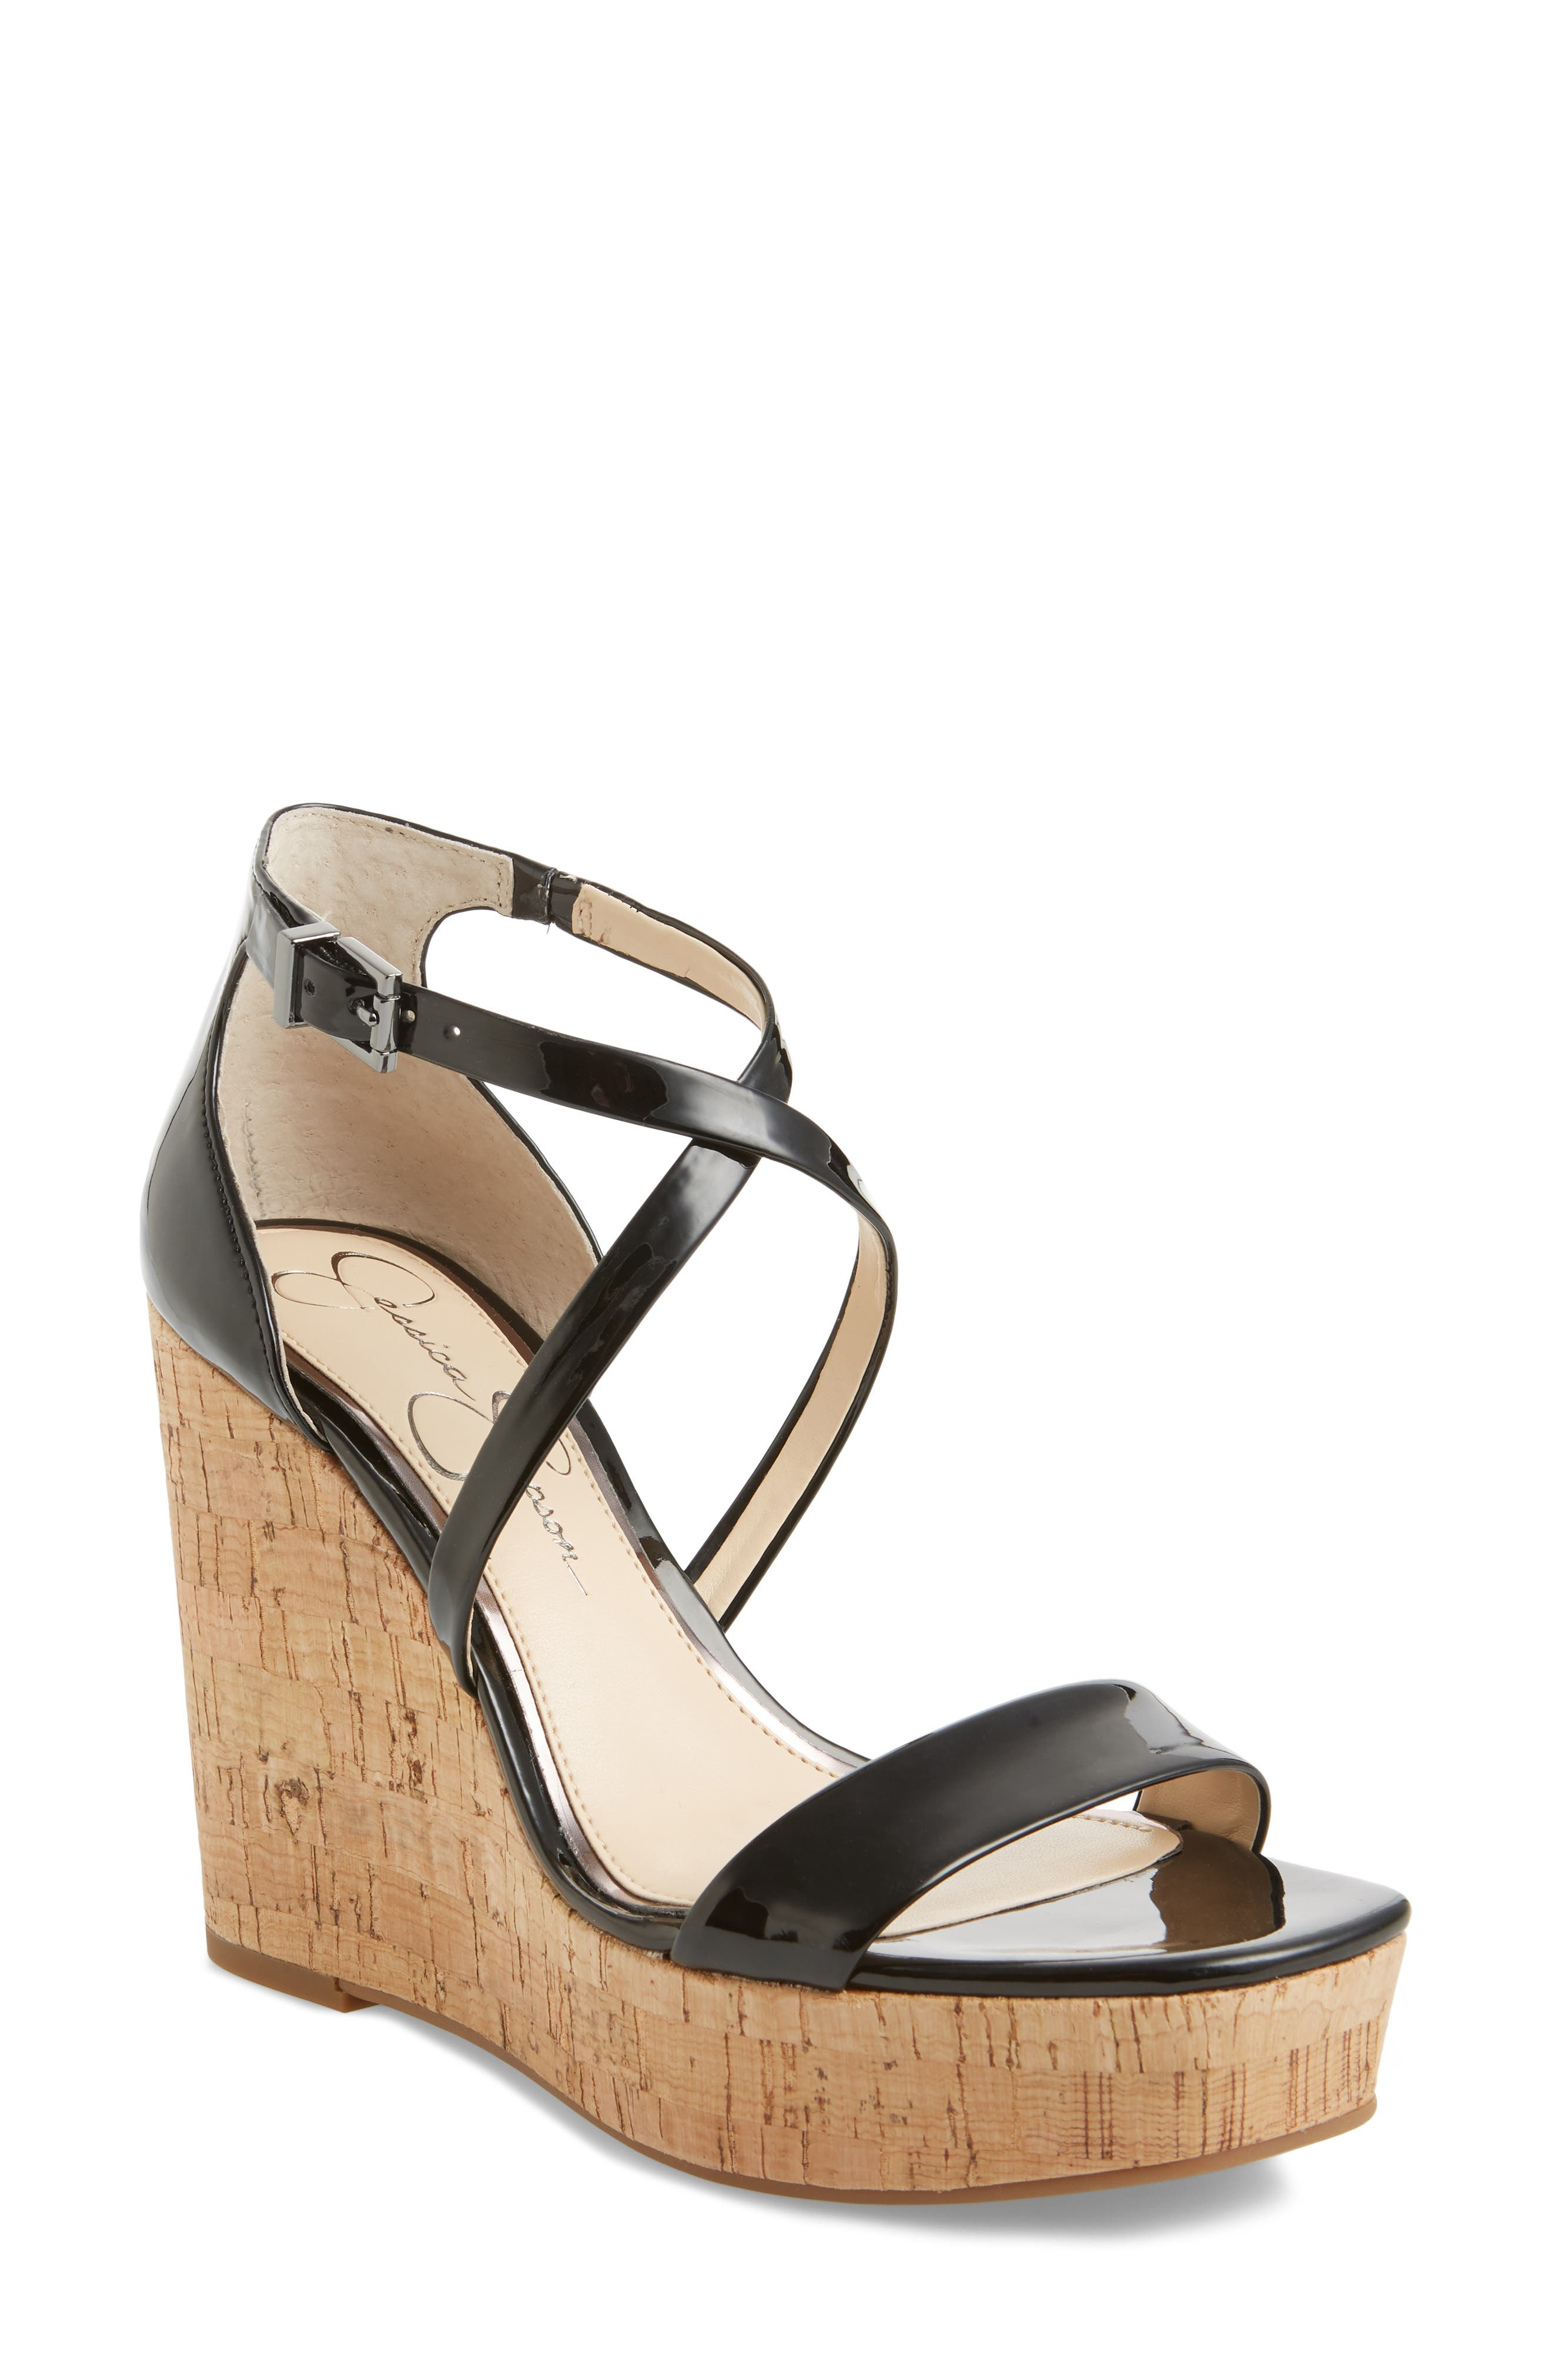 Stassi Cross Strap Wedge Sandal,                         Main,                         color, 001